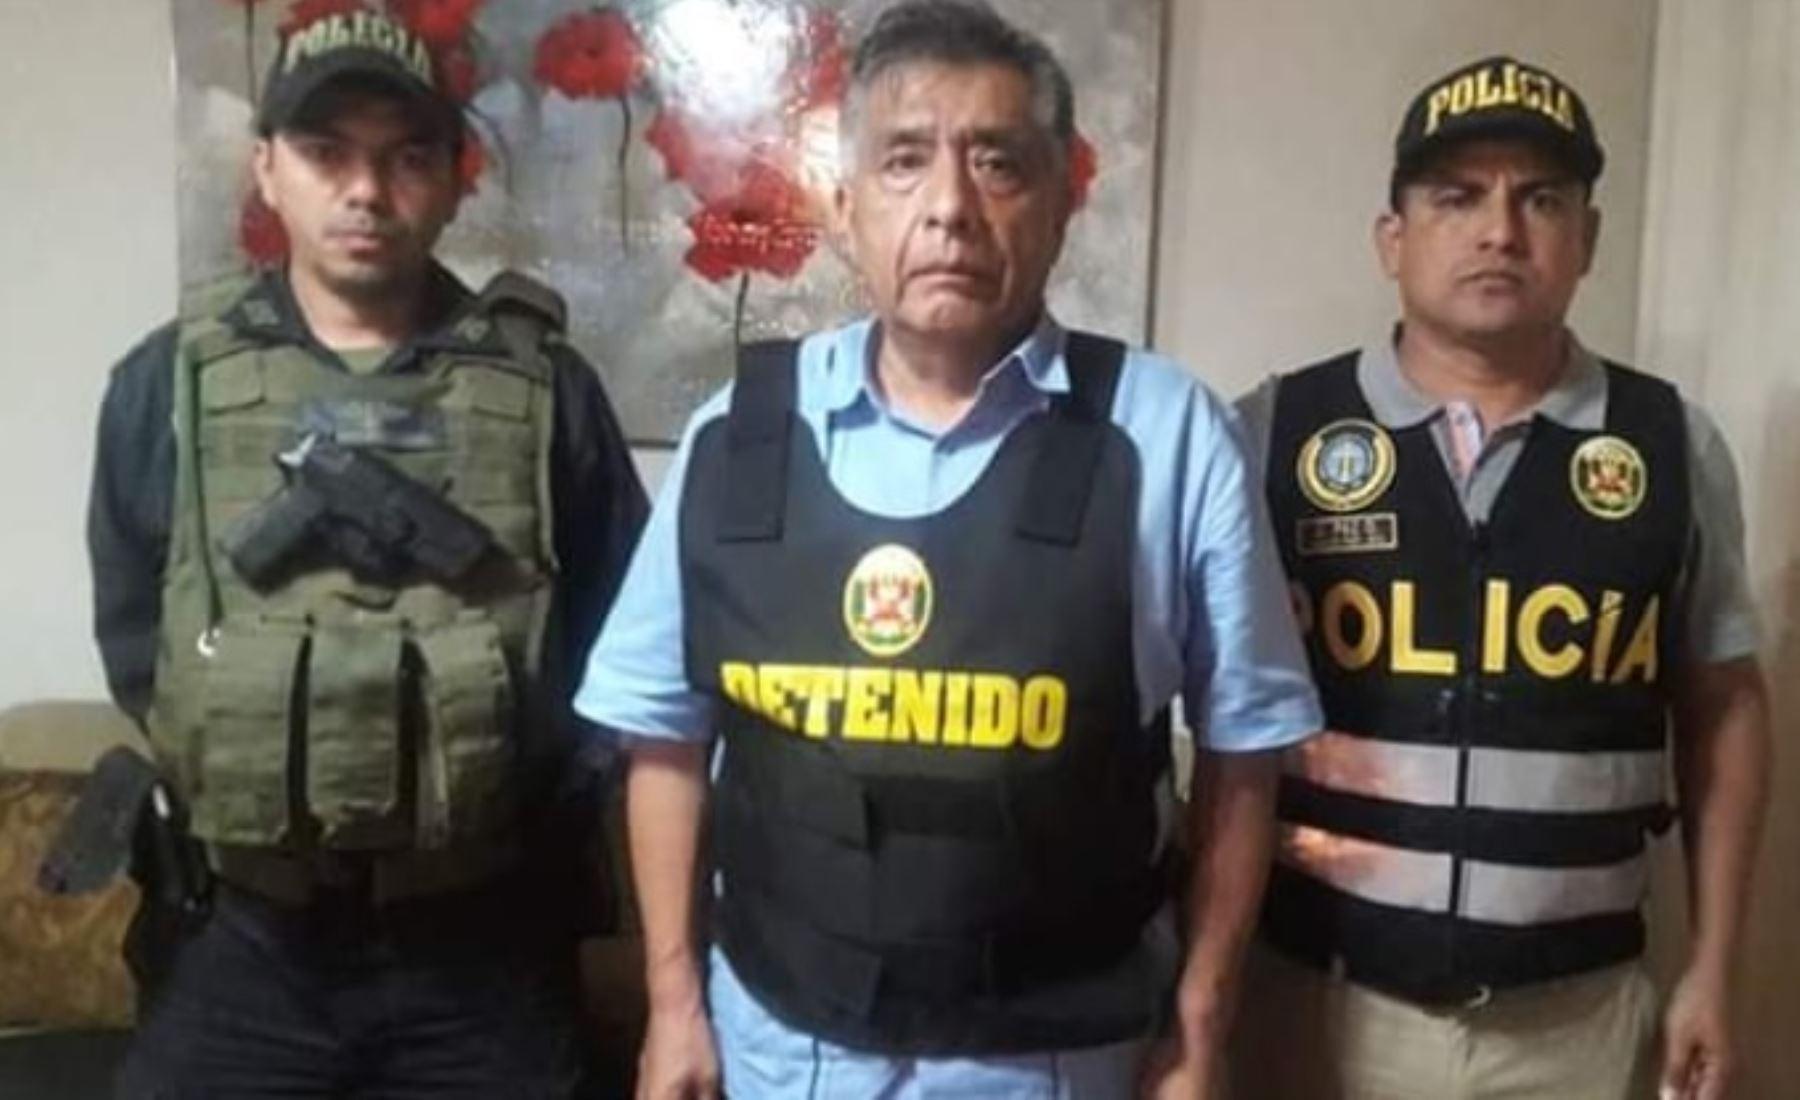 Policía detuvo a alcalde de Chiclayo,David Cornejo, presunto cabecilla de organización criminal. ANDINA/Difusión